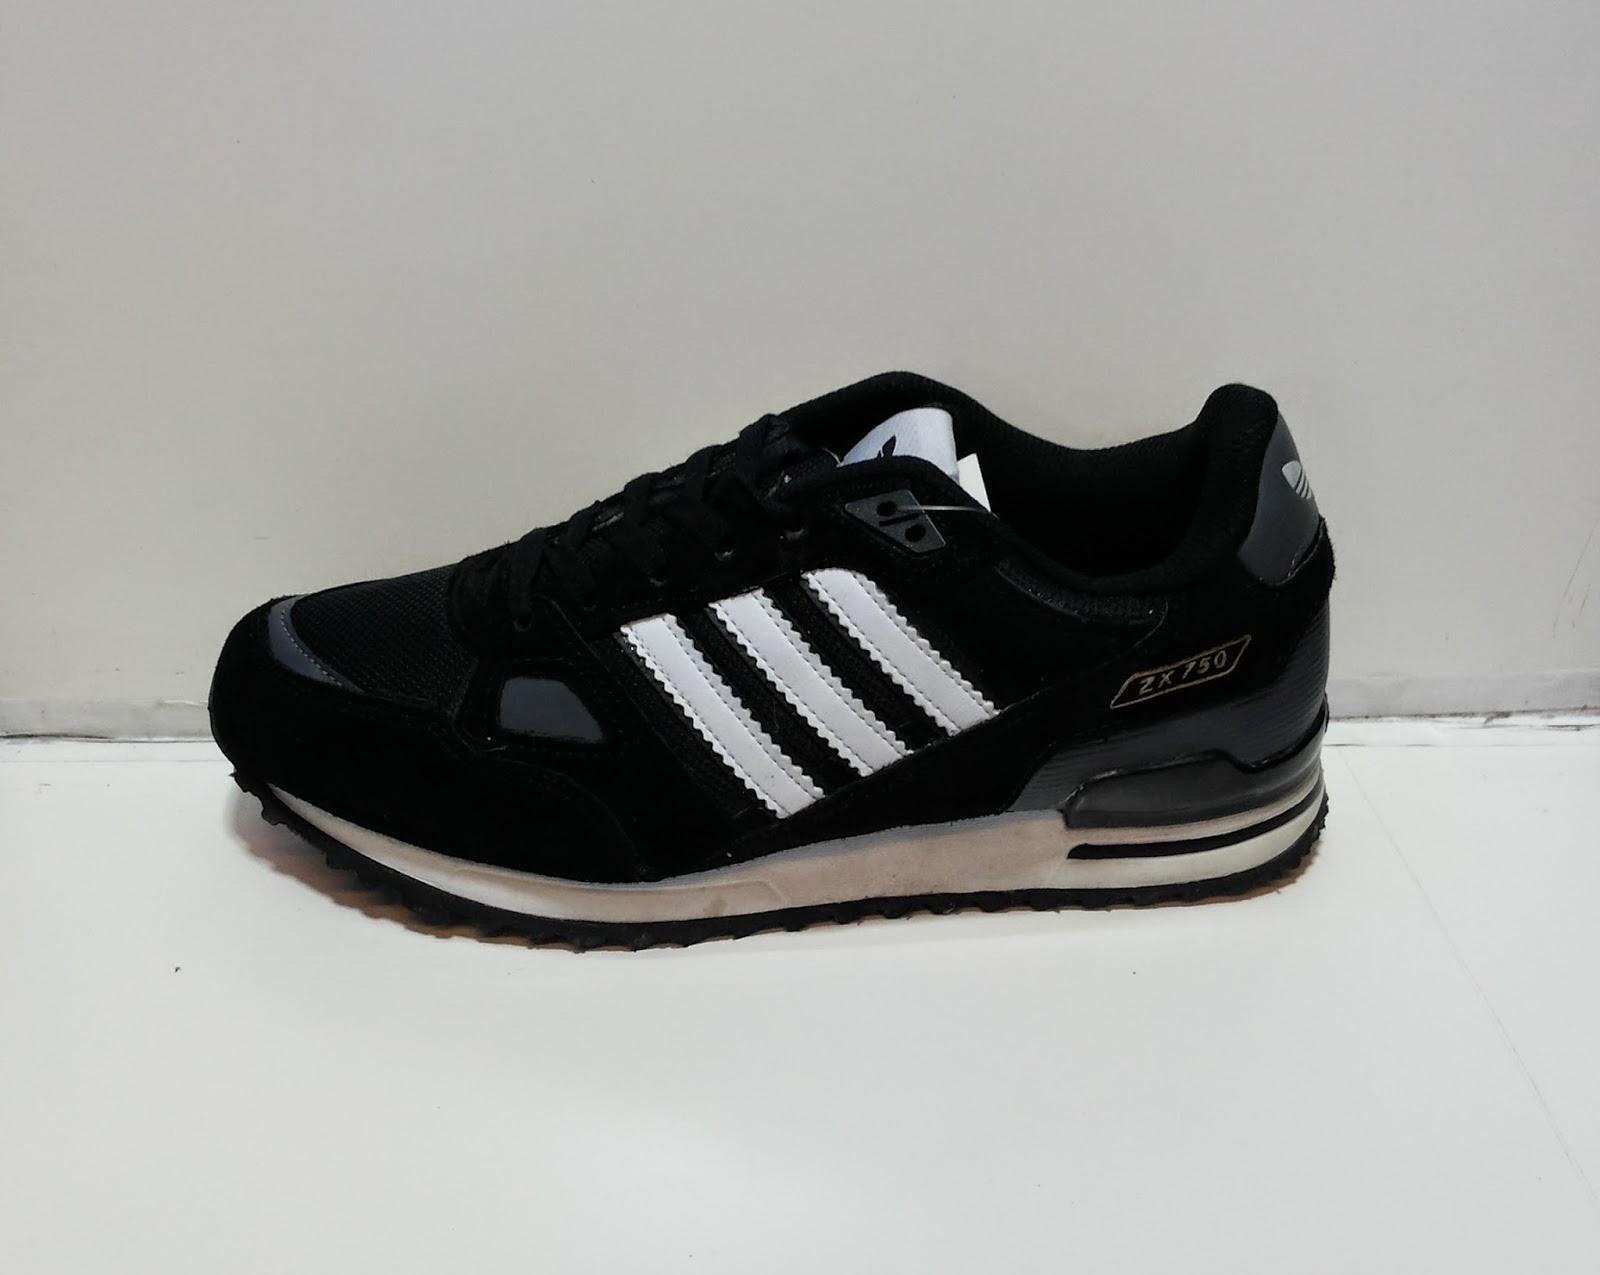 ... spain sepatu adidas zx 750 mens jual adidas zx 750 mens beli adidas zx  750 e8fc6 ... 0af35ff300